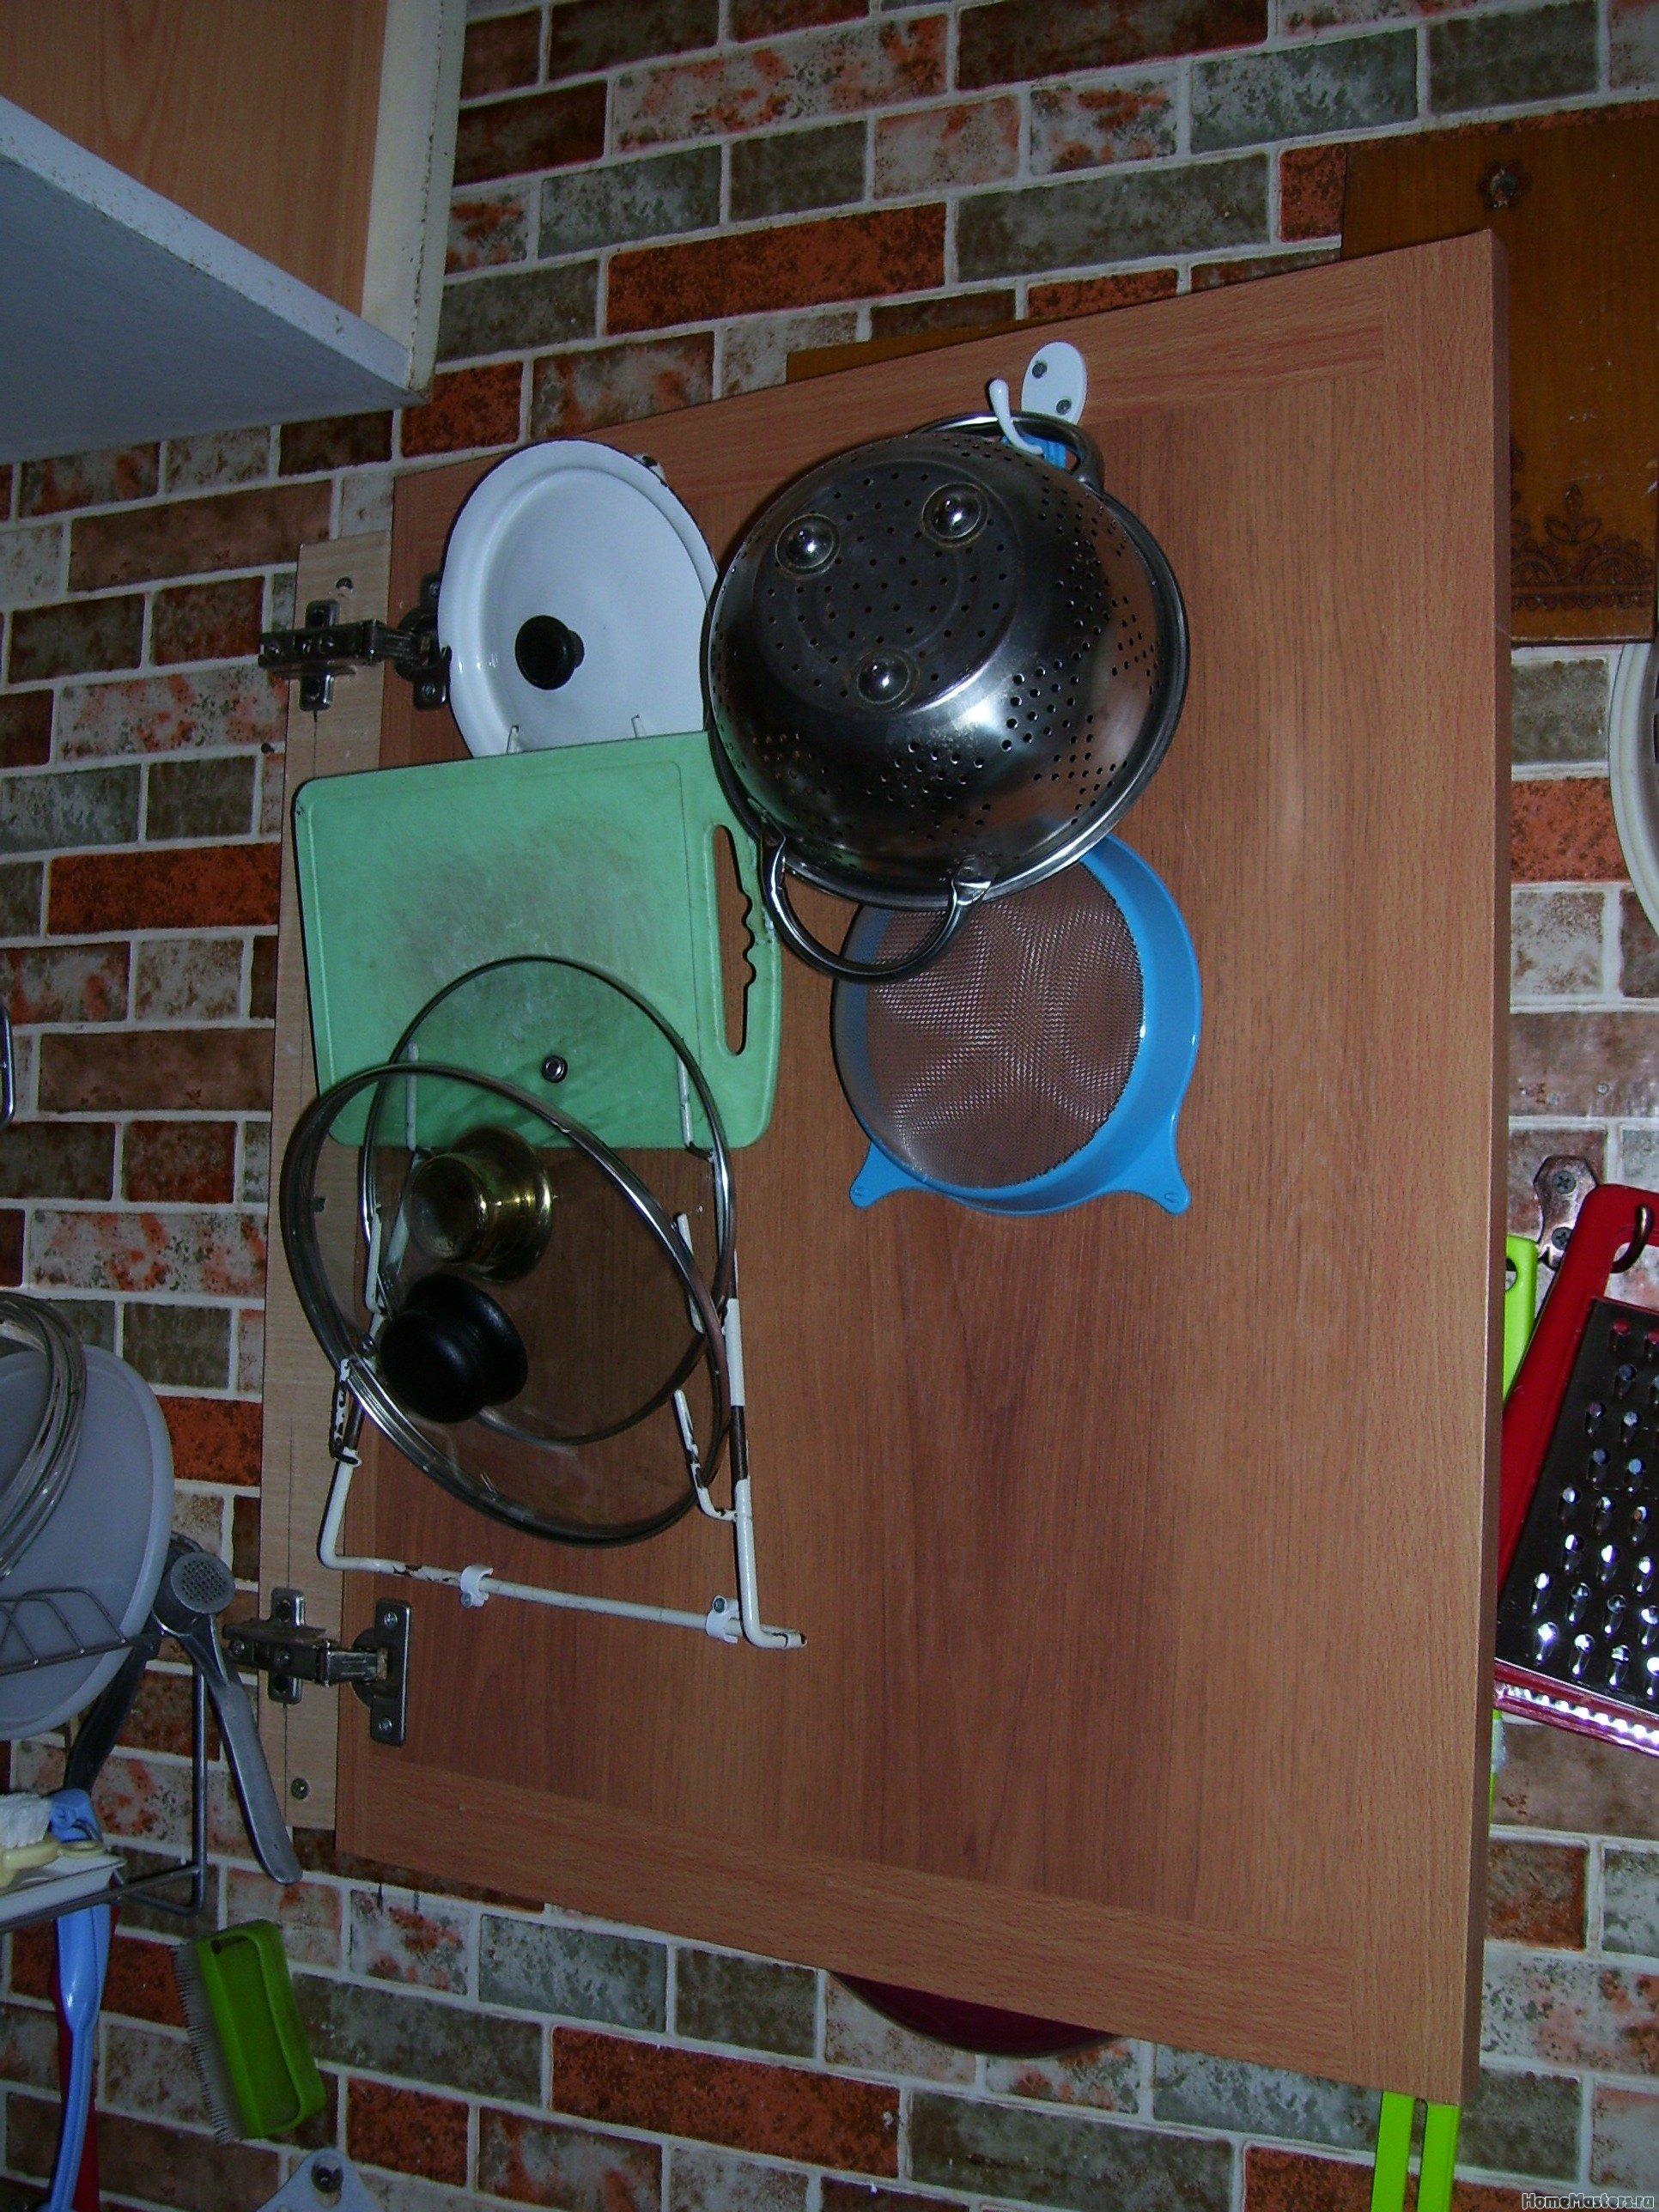 Дверца, закрывающая сушилку для посуды.